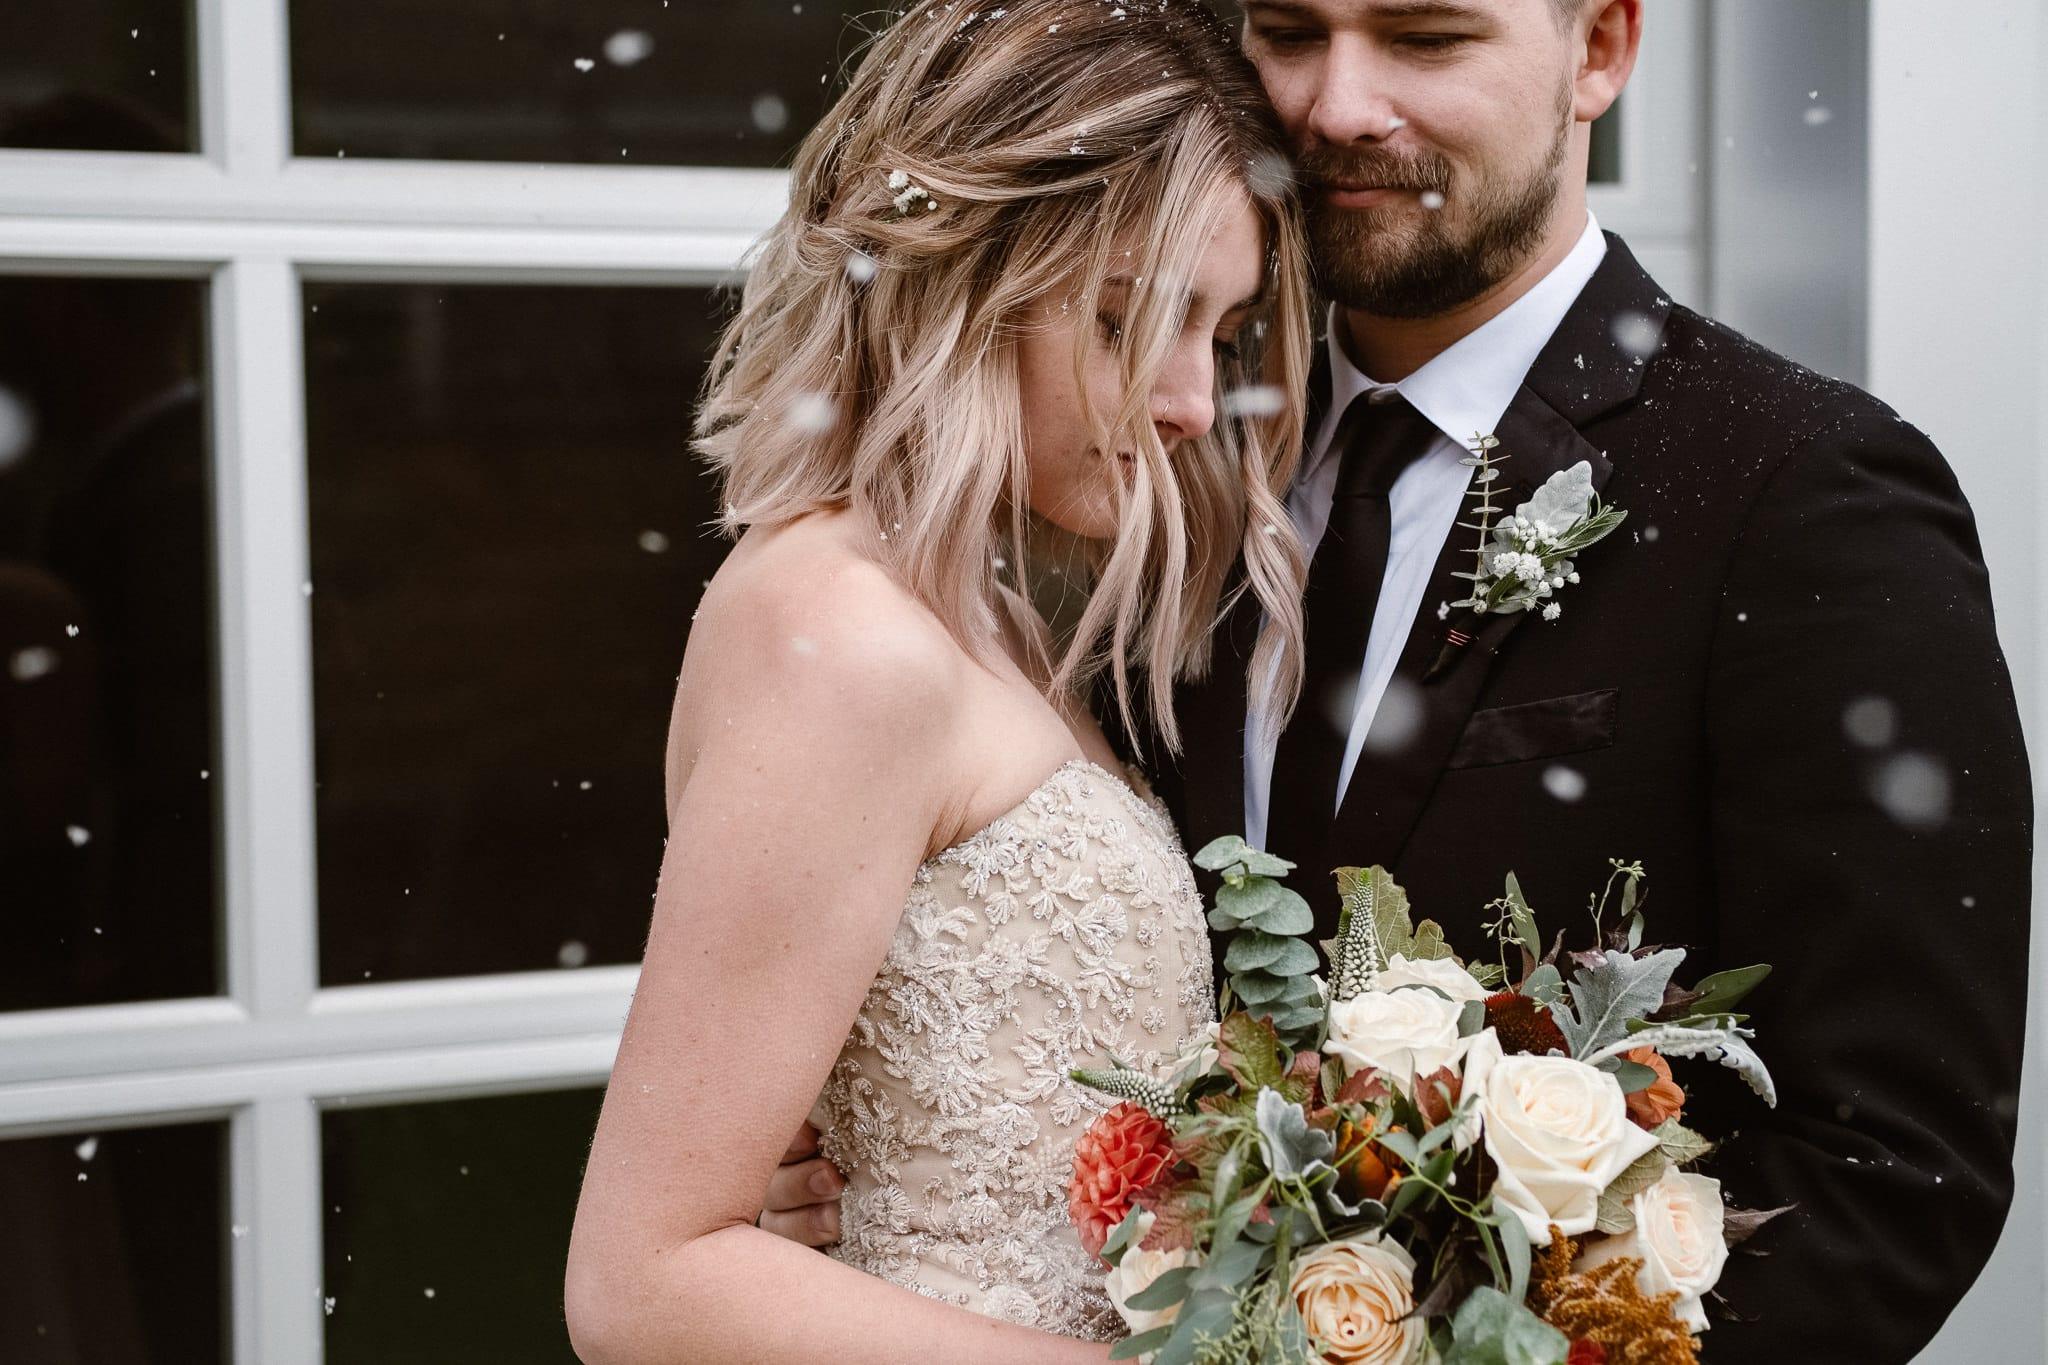 St Vrain Wedding Photographer | Longmont Wedding Photographer | Colorado Winter Wedding Photographer, Colorado industrial chic wedding, bride and groom portraits in snow